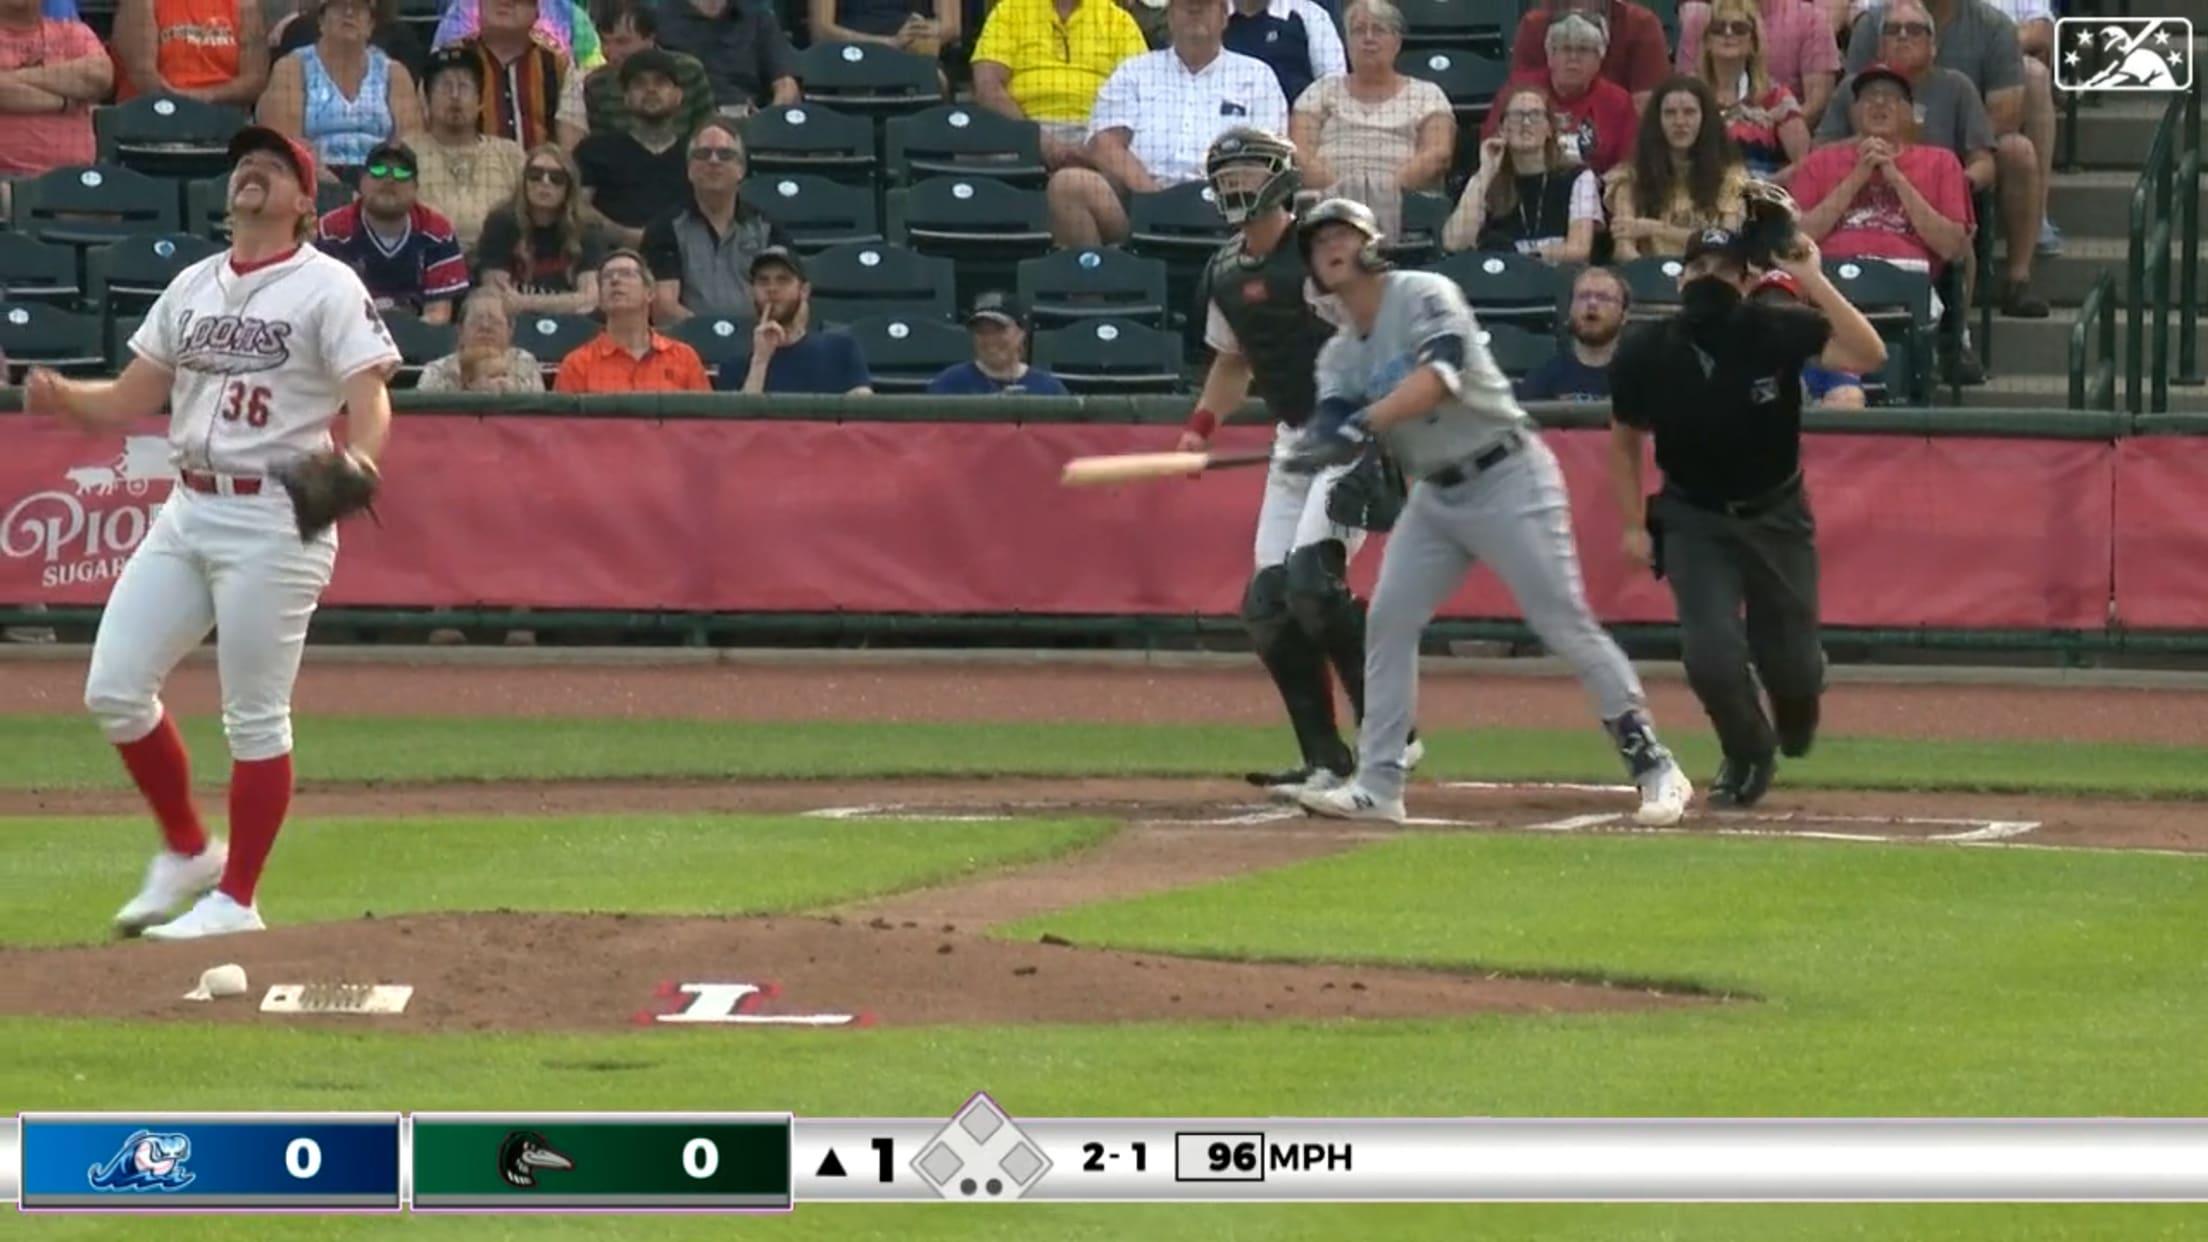 Spencer Torkelson's 4th homer